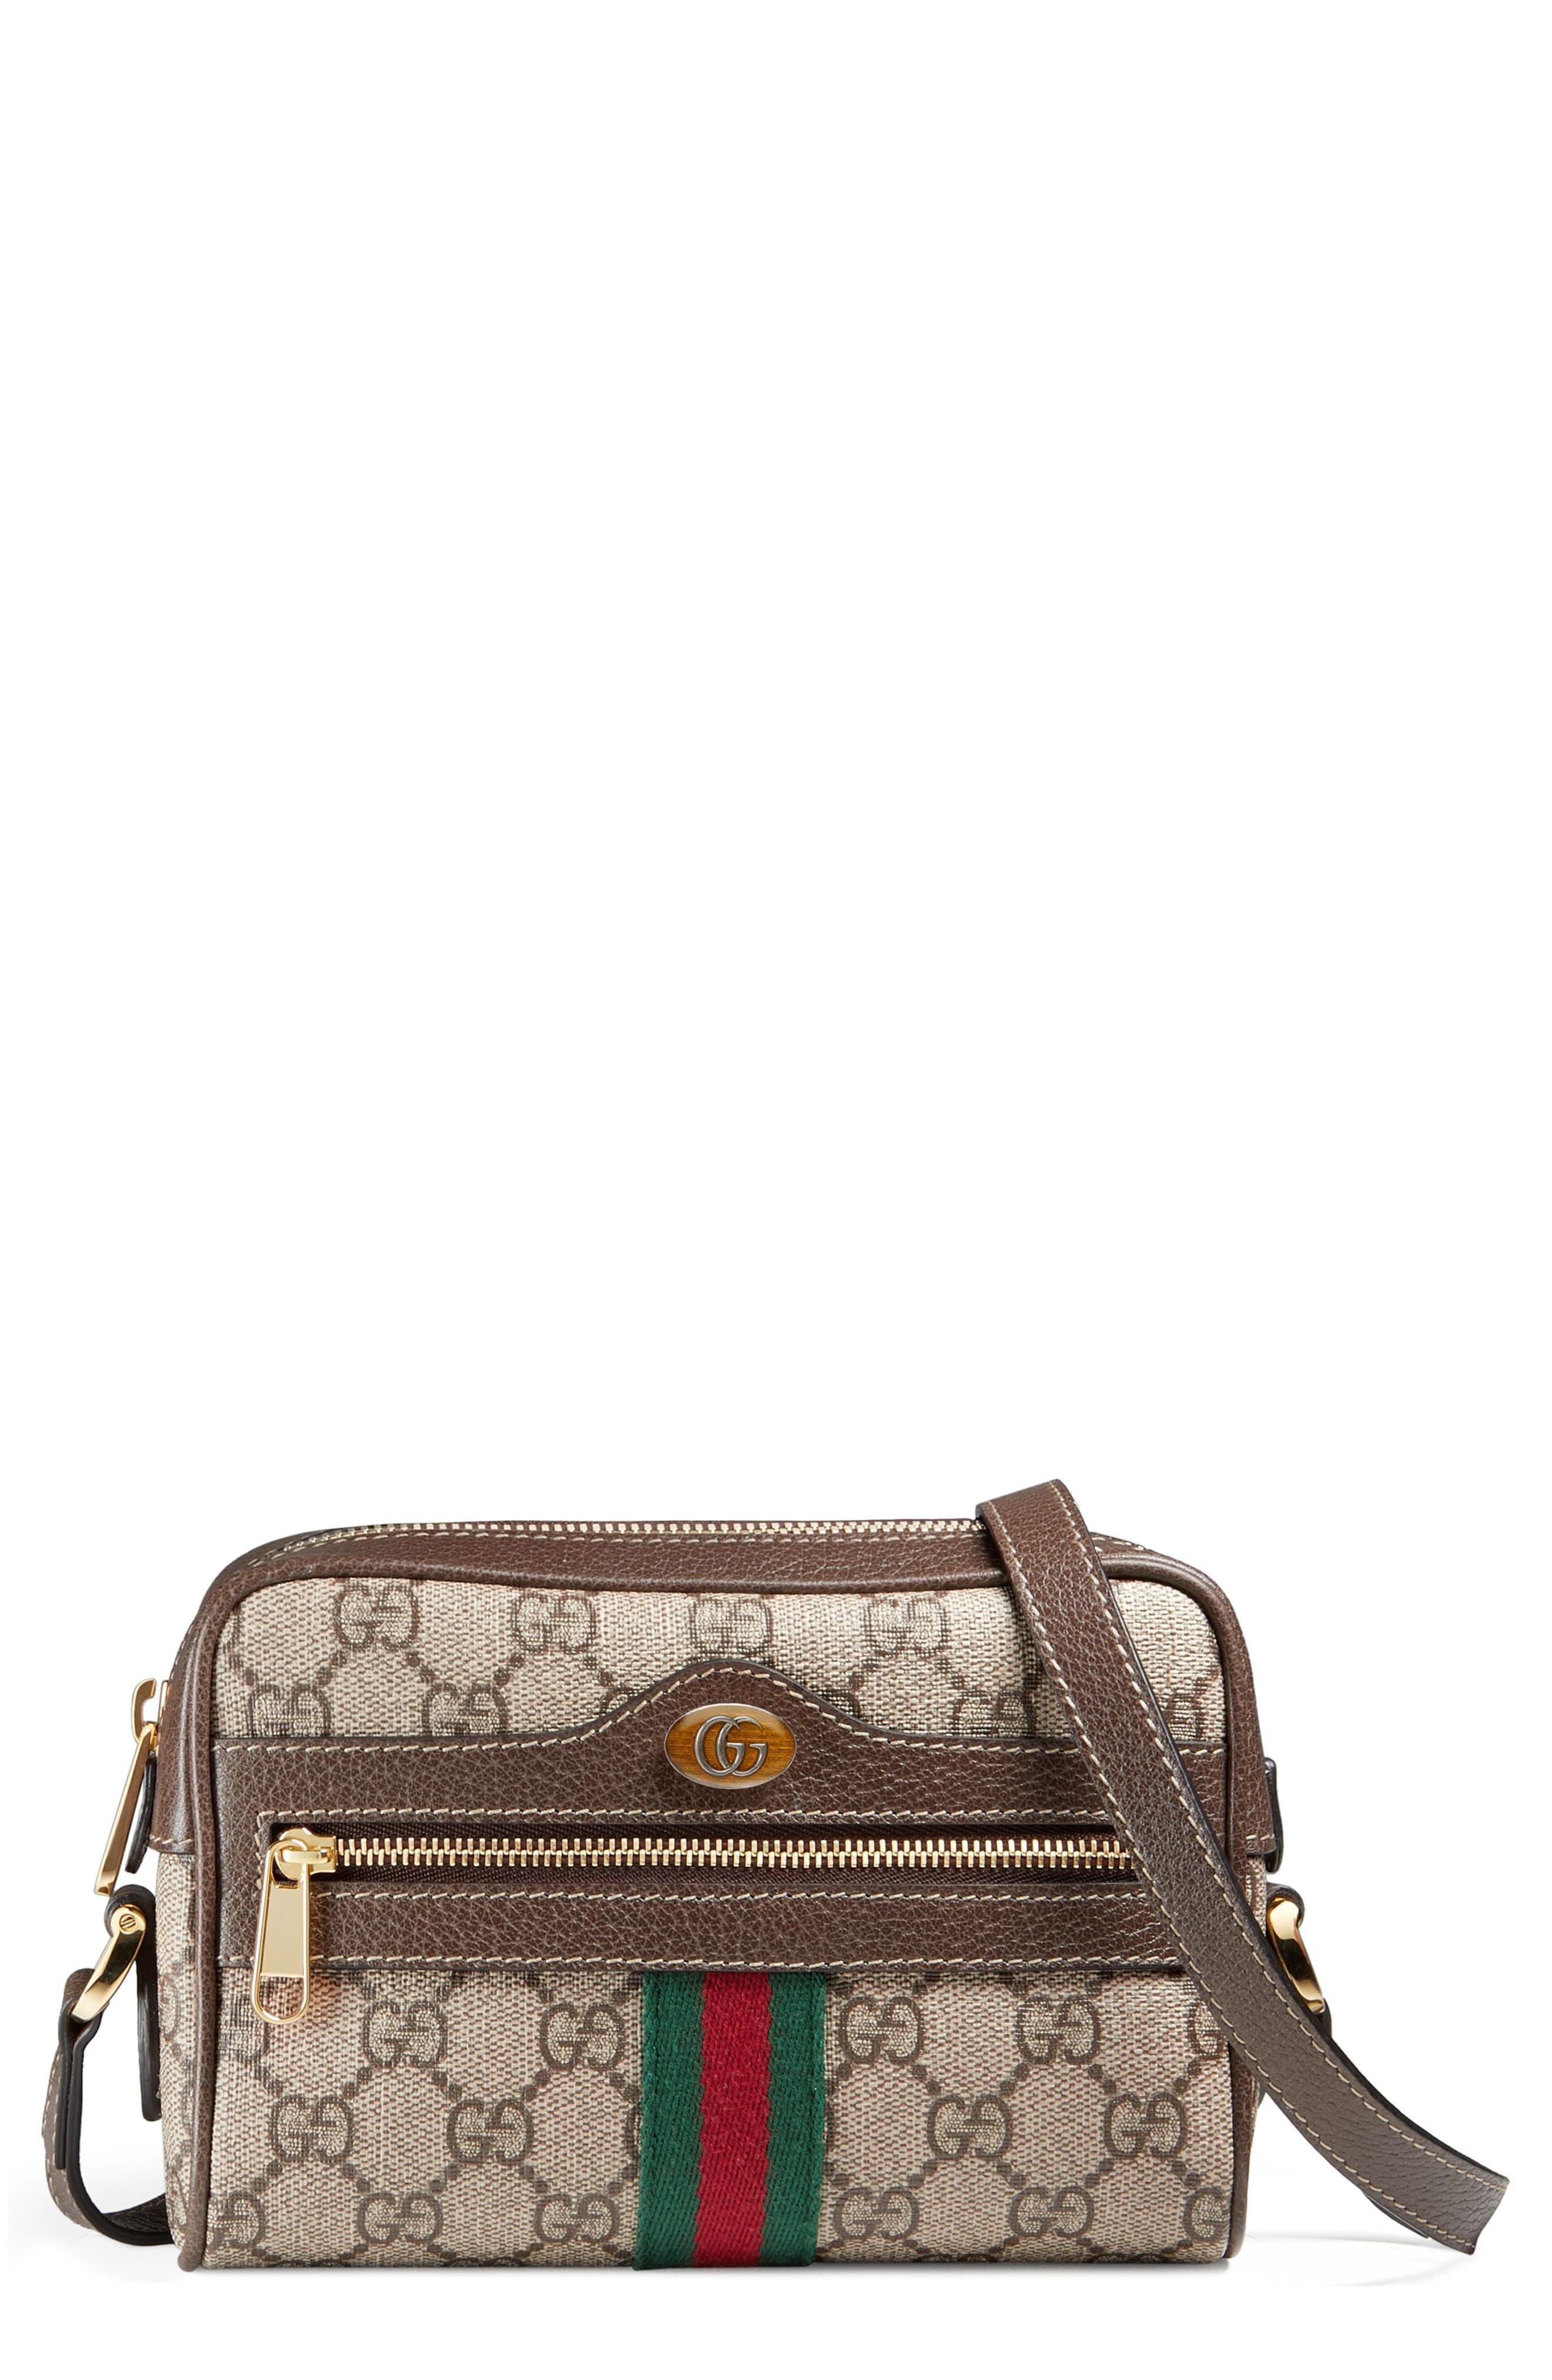 79f2ab6d007e Gucci Ophidia Small Gg Supreme Canvas Crossbody Bag in Natural ...